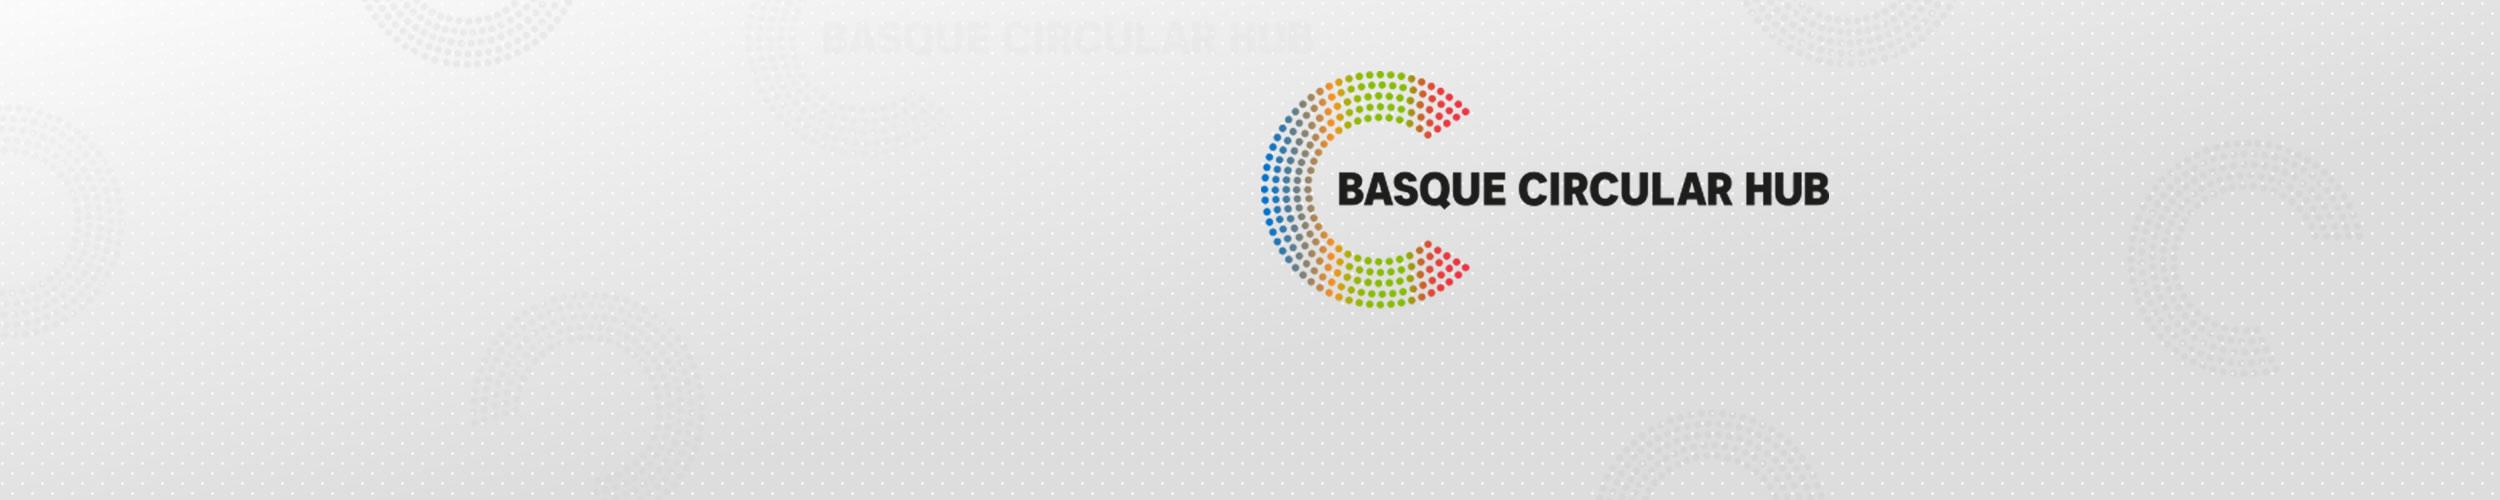 cabecera Basque Circular Hub